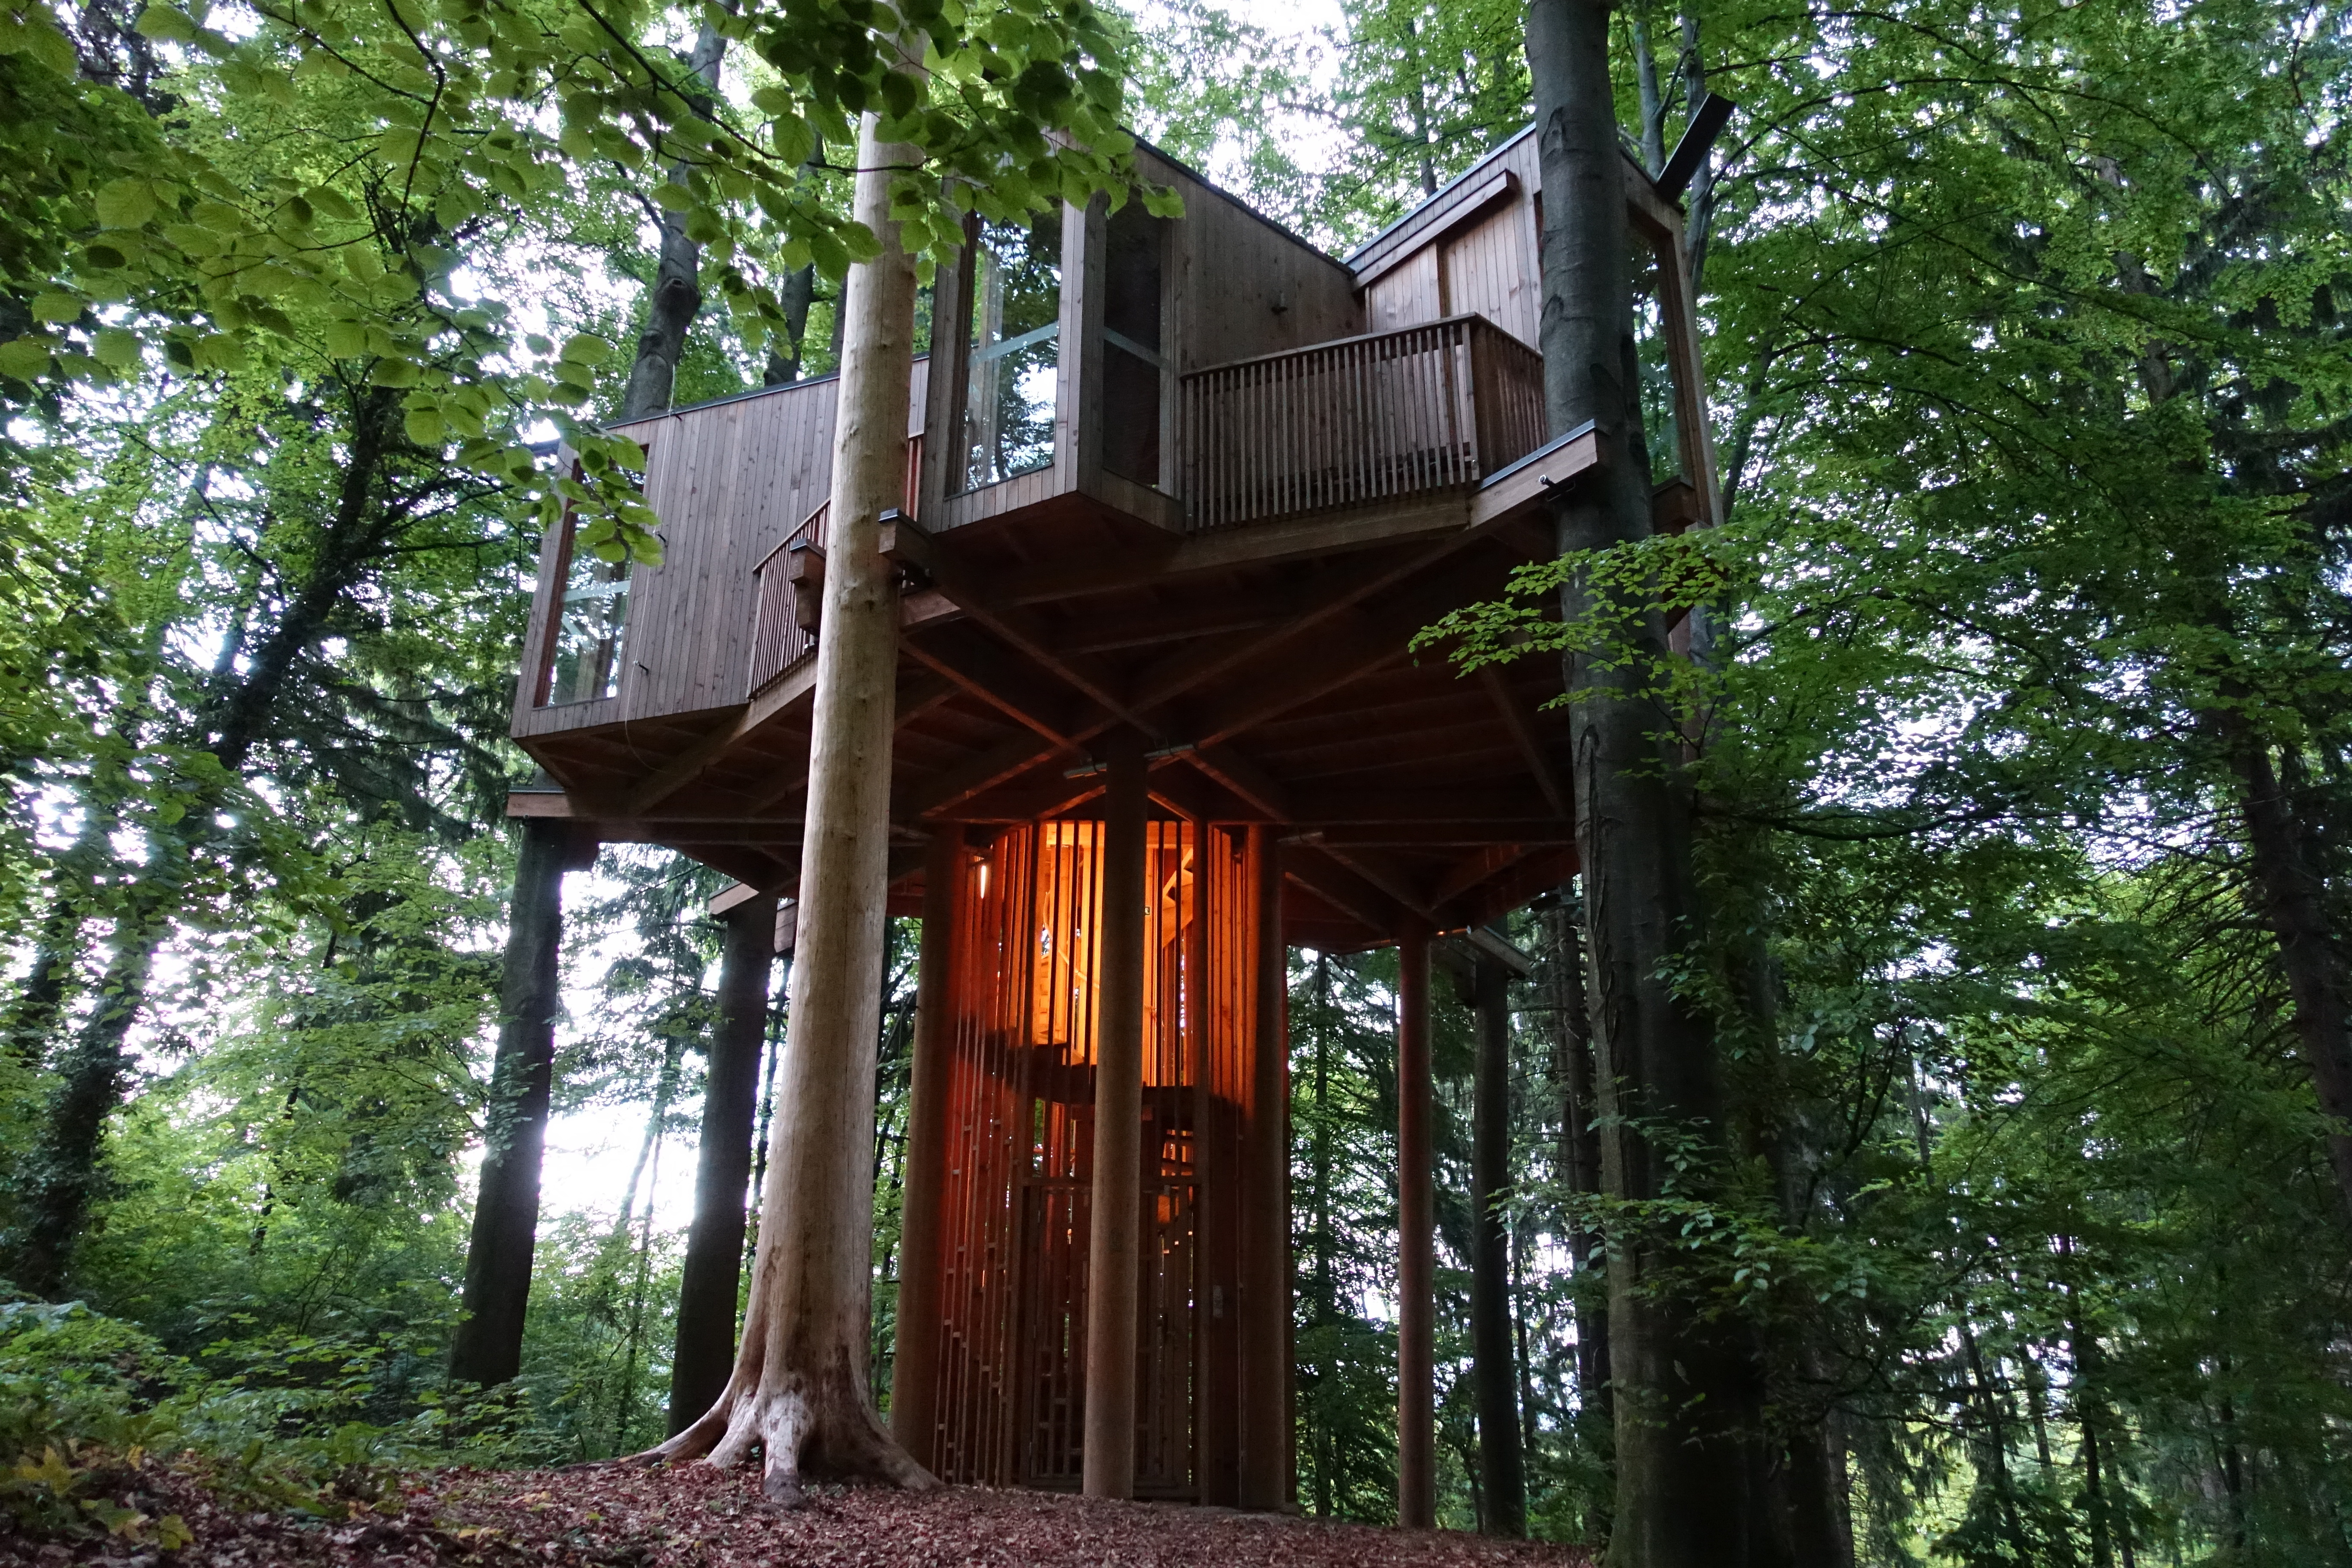 Tree top house shutterstock_636048011 co